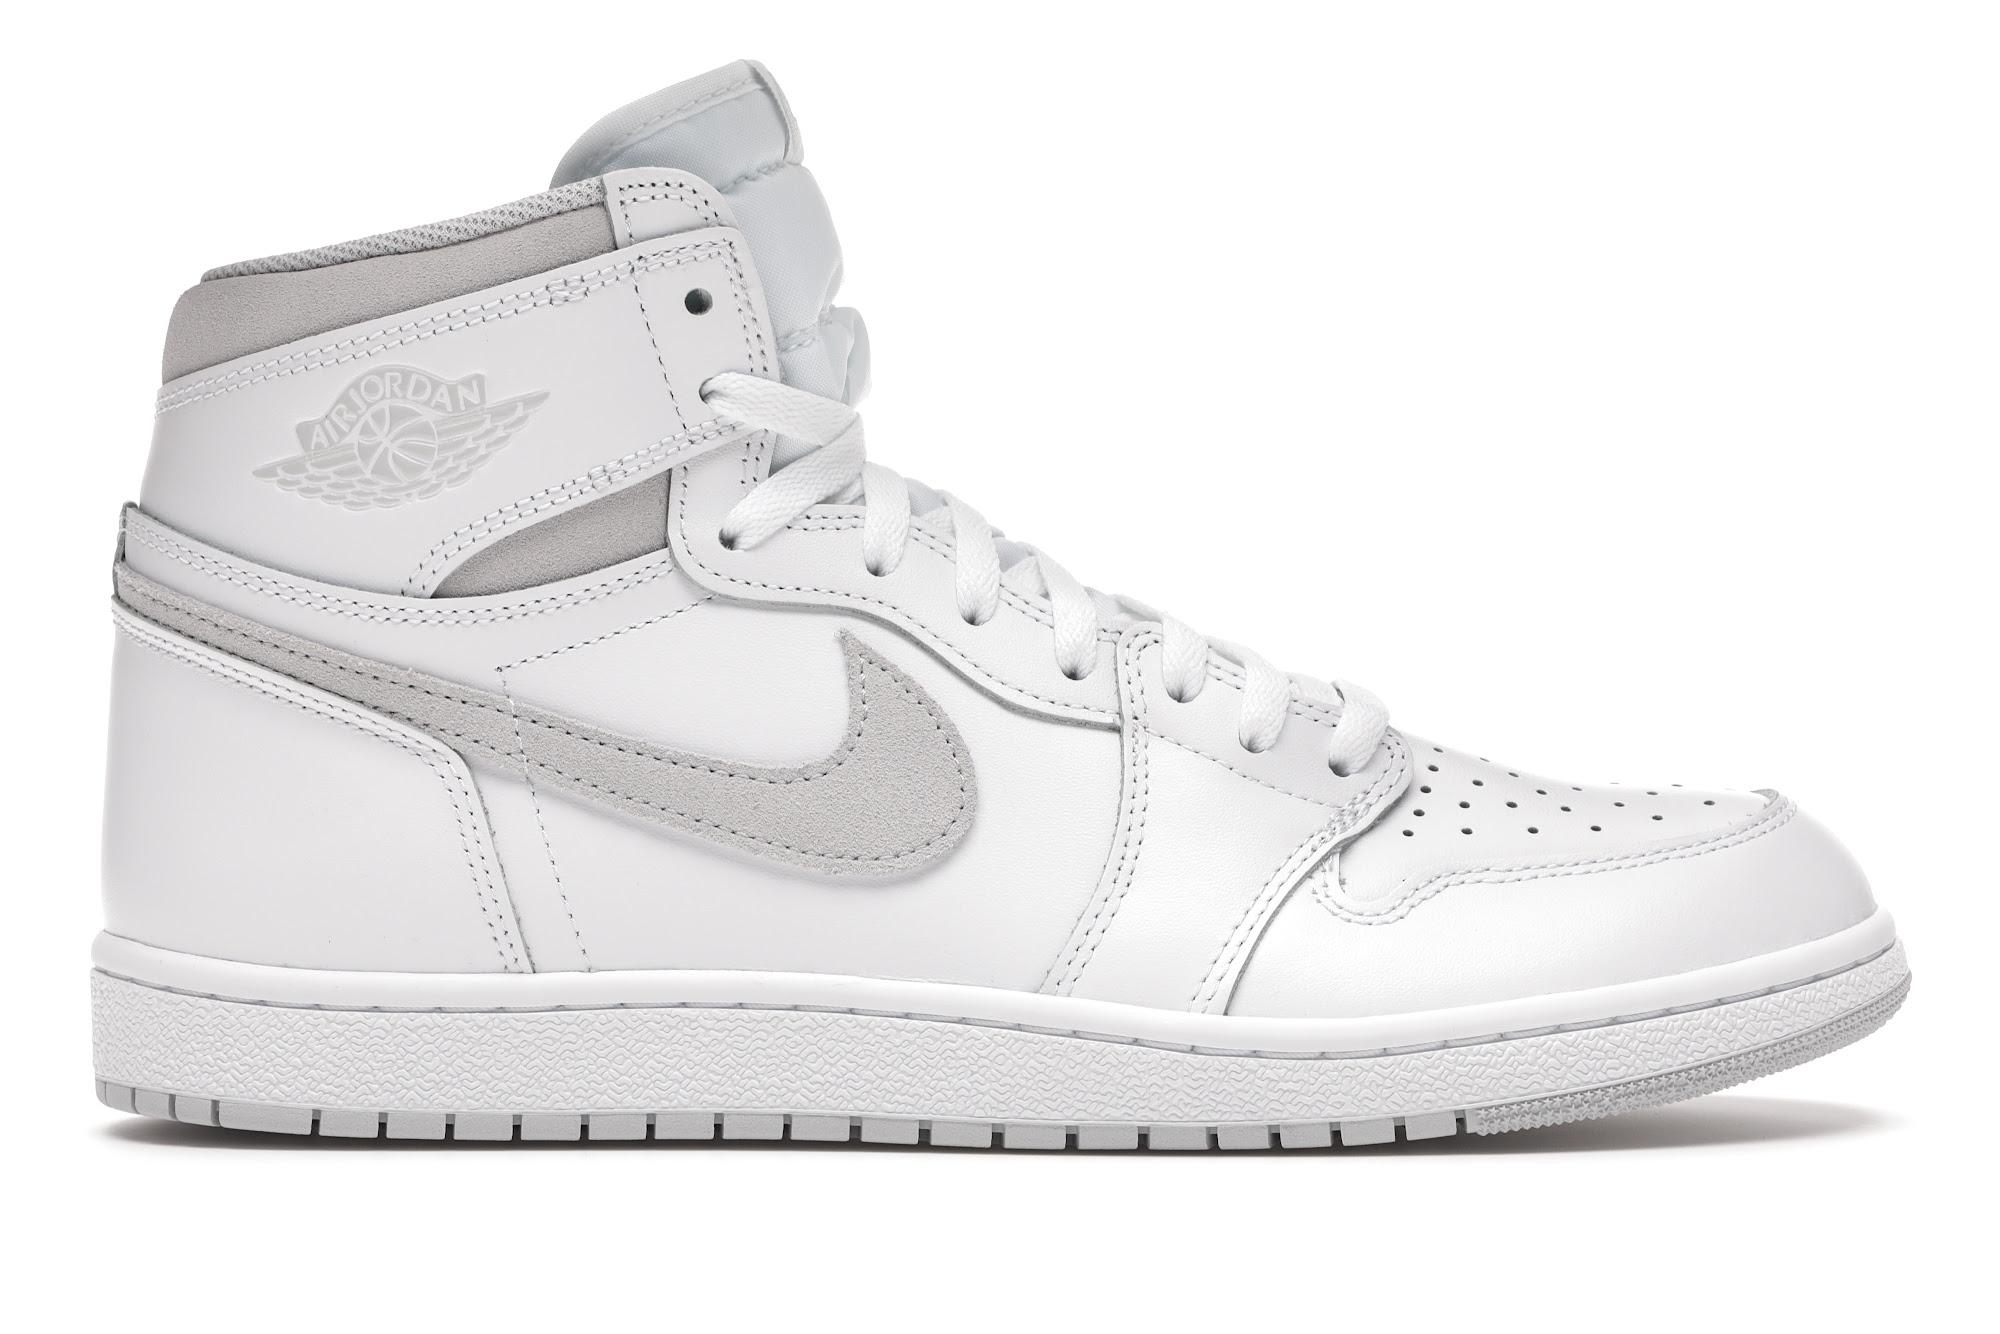 Jordan 1 Retro High 85 Neutral Grey